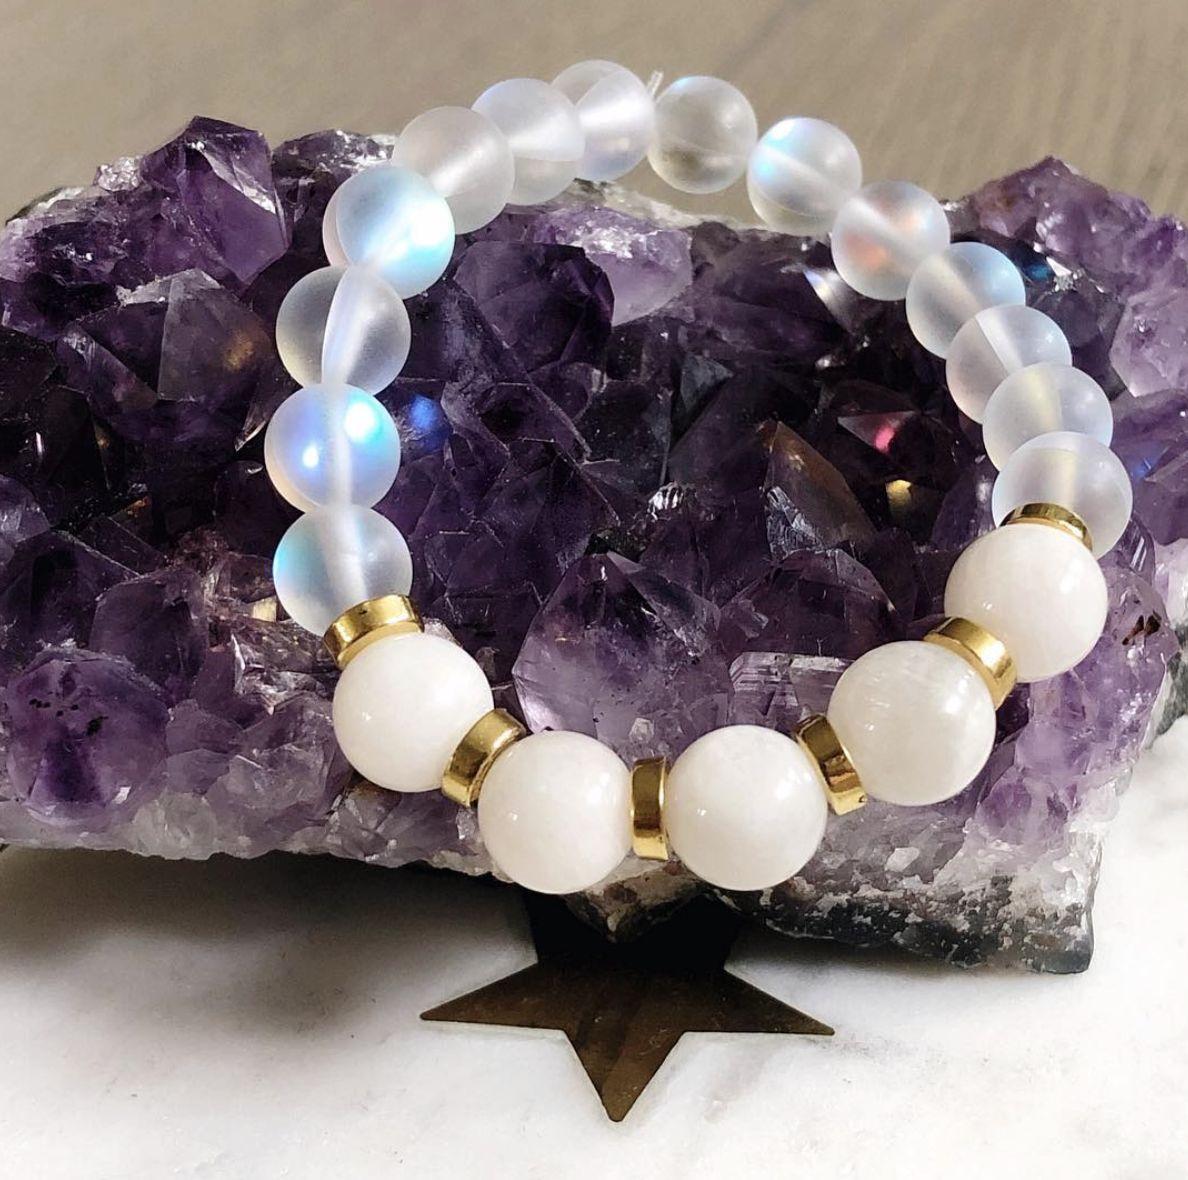 Empress Mala Designs, Moonstone and Aura Quartz Mala Bead Bracelet, Made In Canada